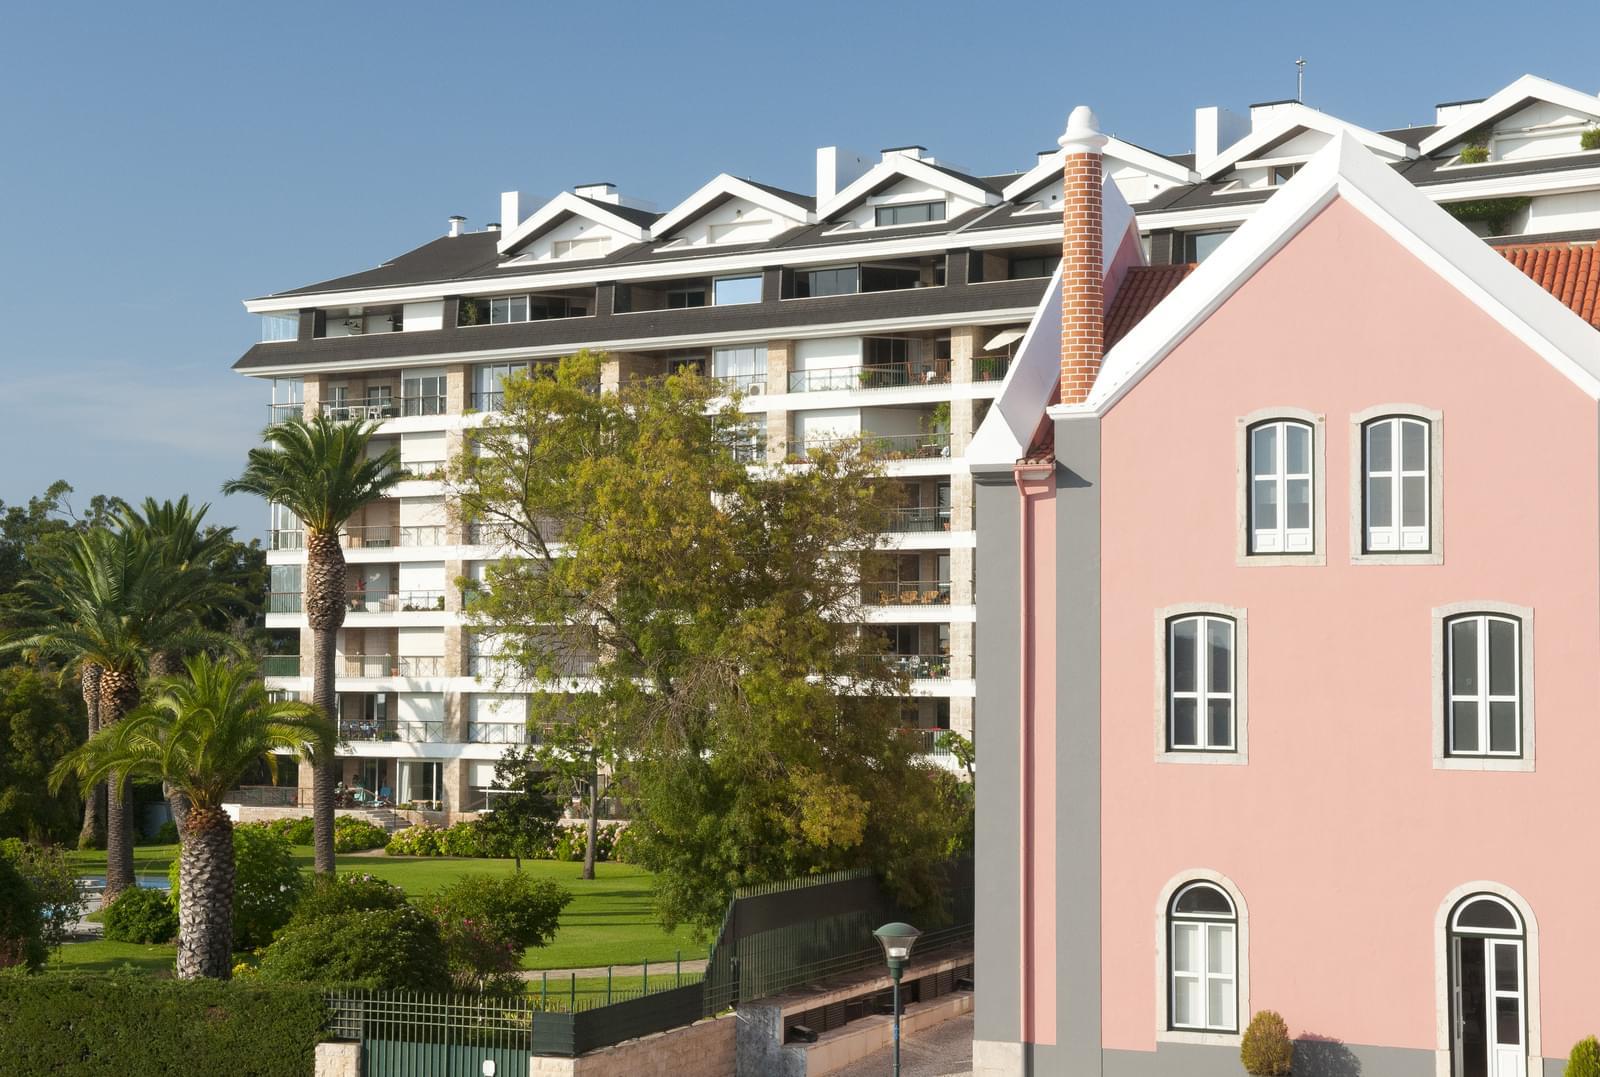 pf17830-apartamento-t2-cascais-472d0856-c39b-4d32-adfd-b120d590d803